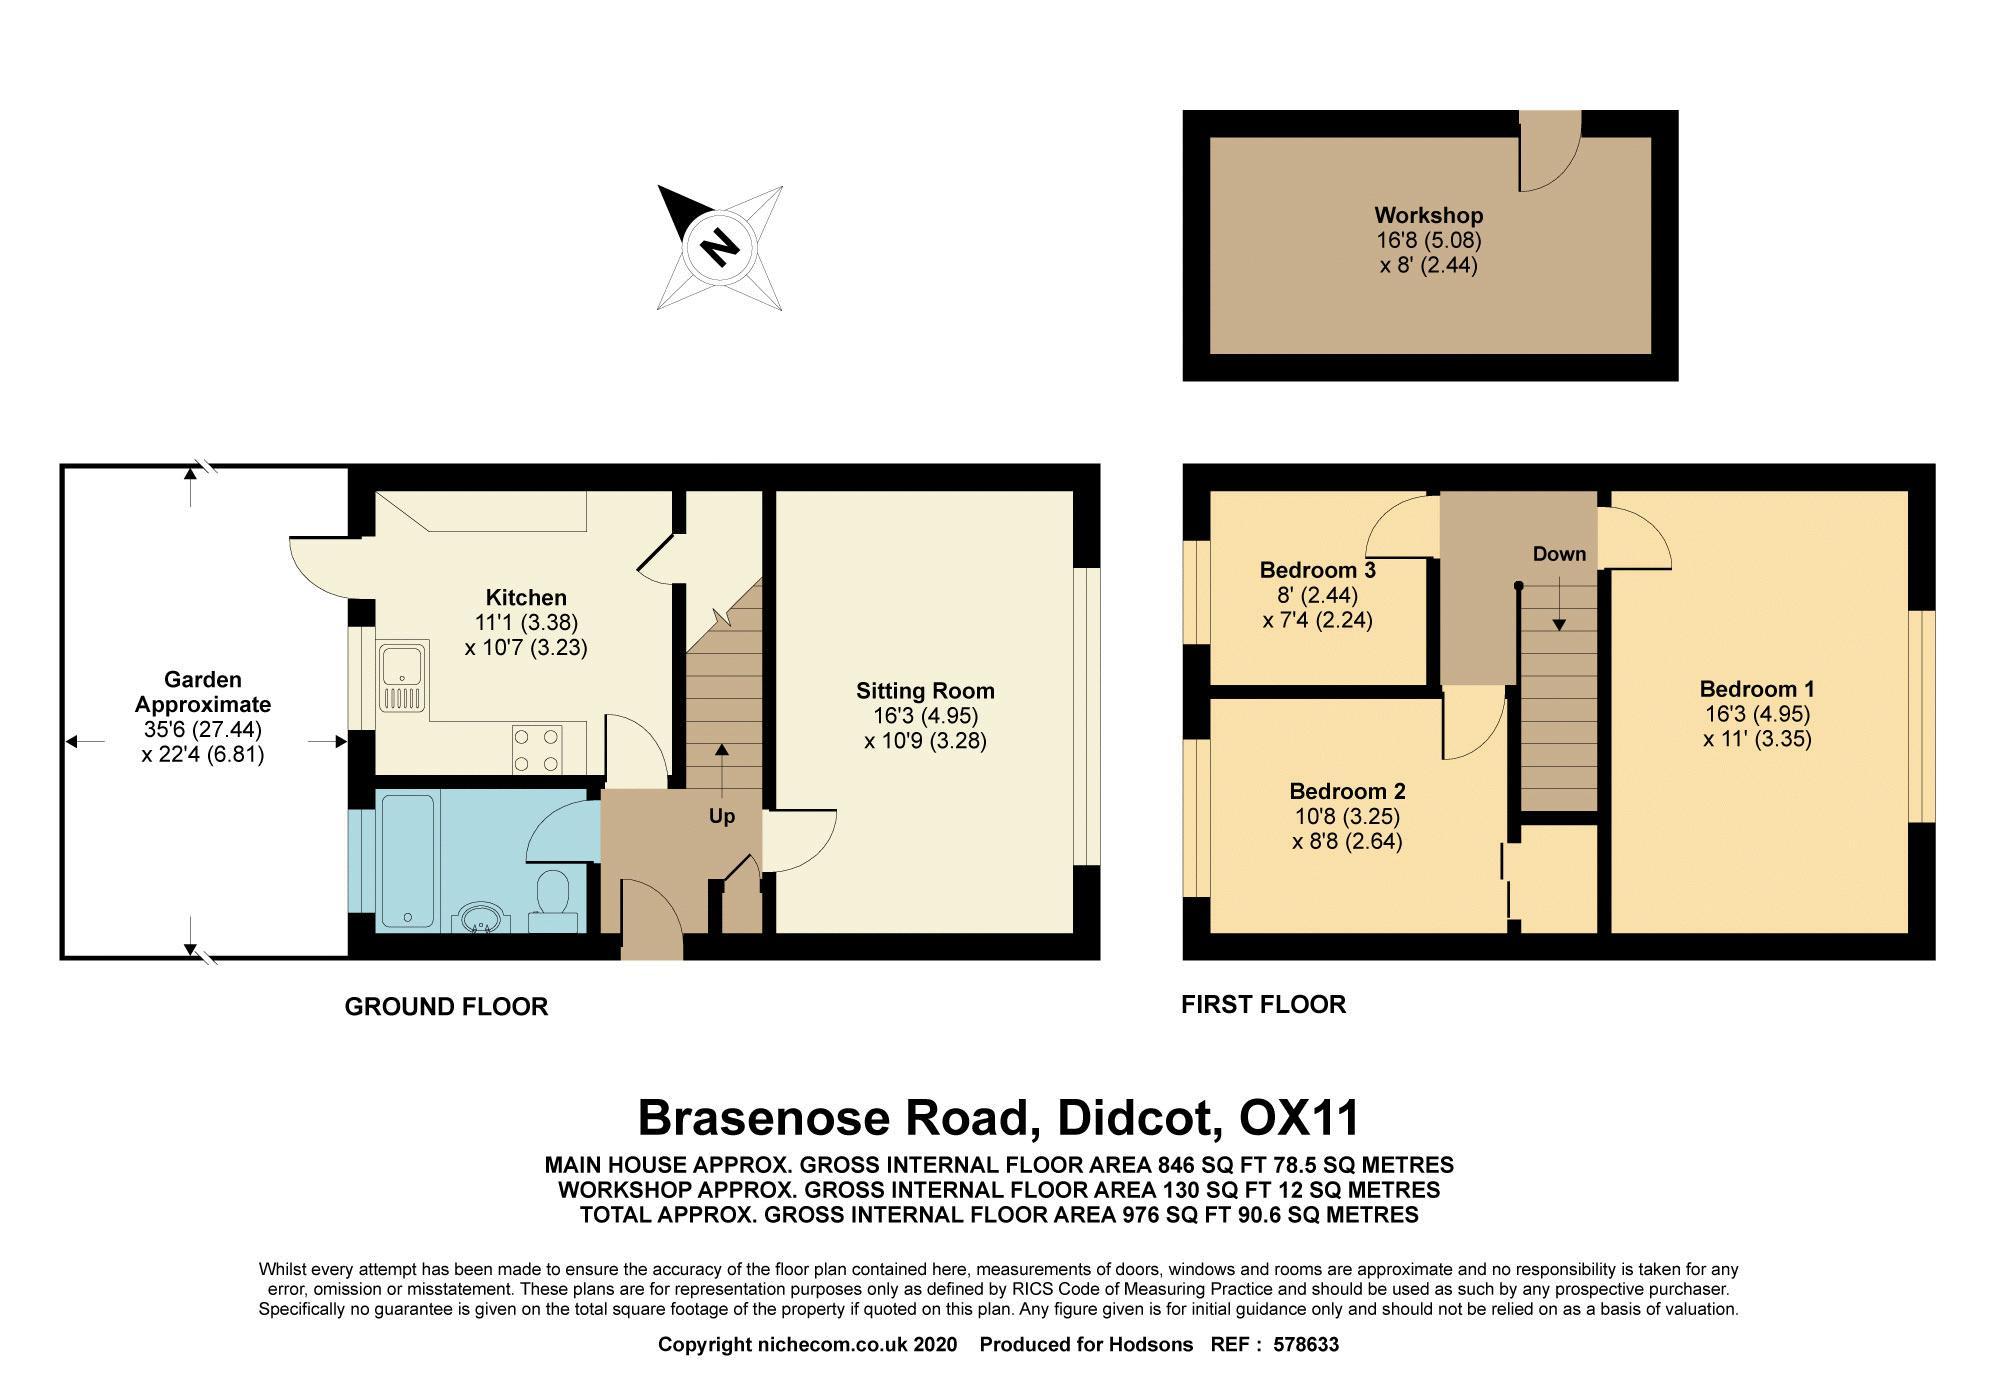 Brasenose Road